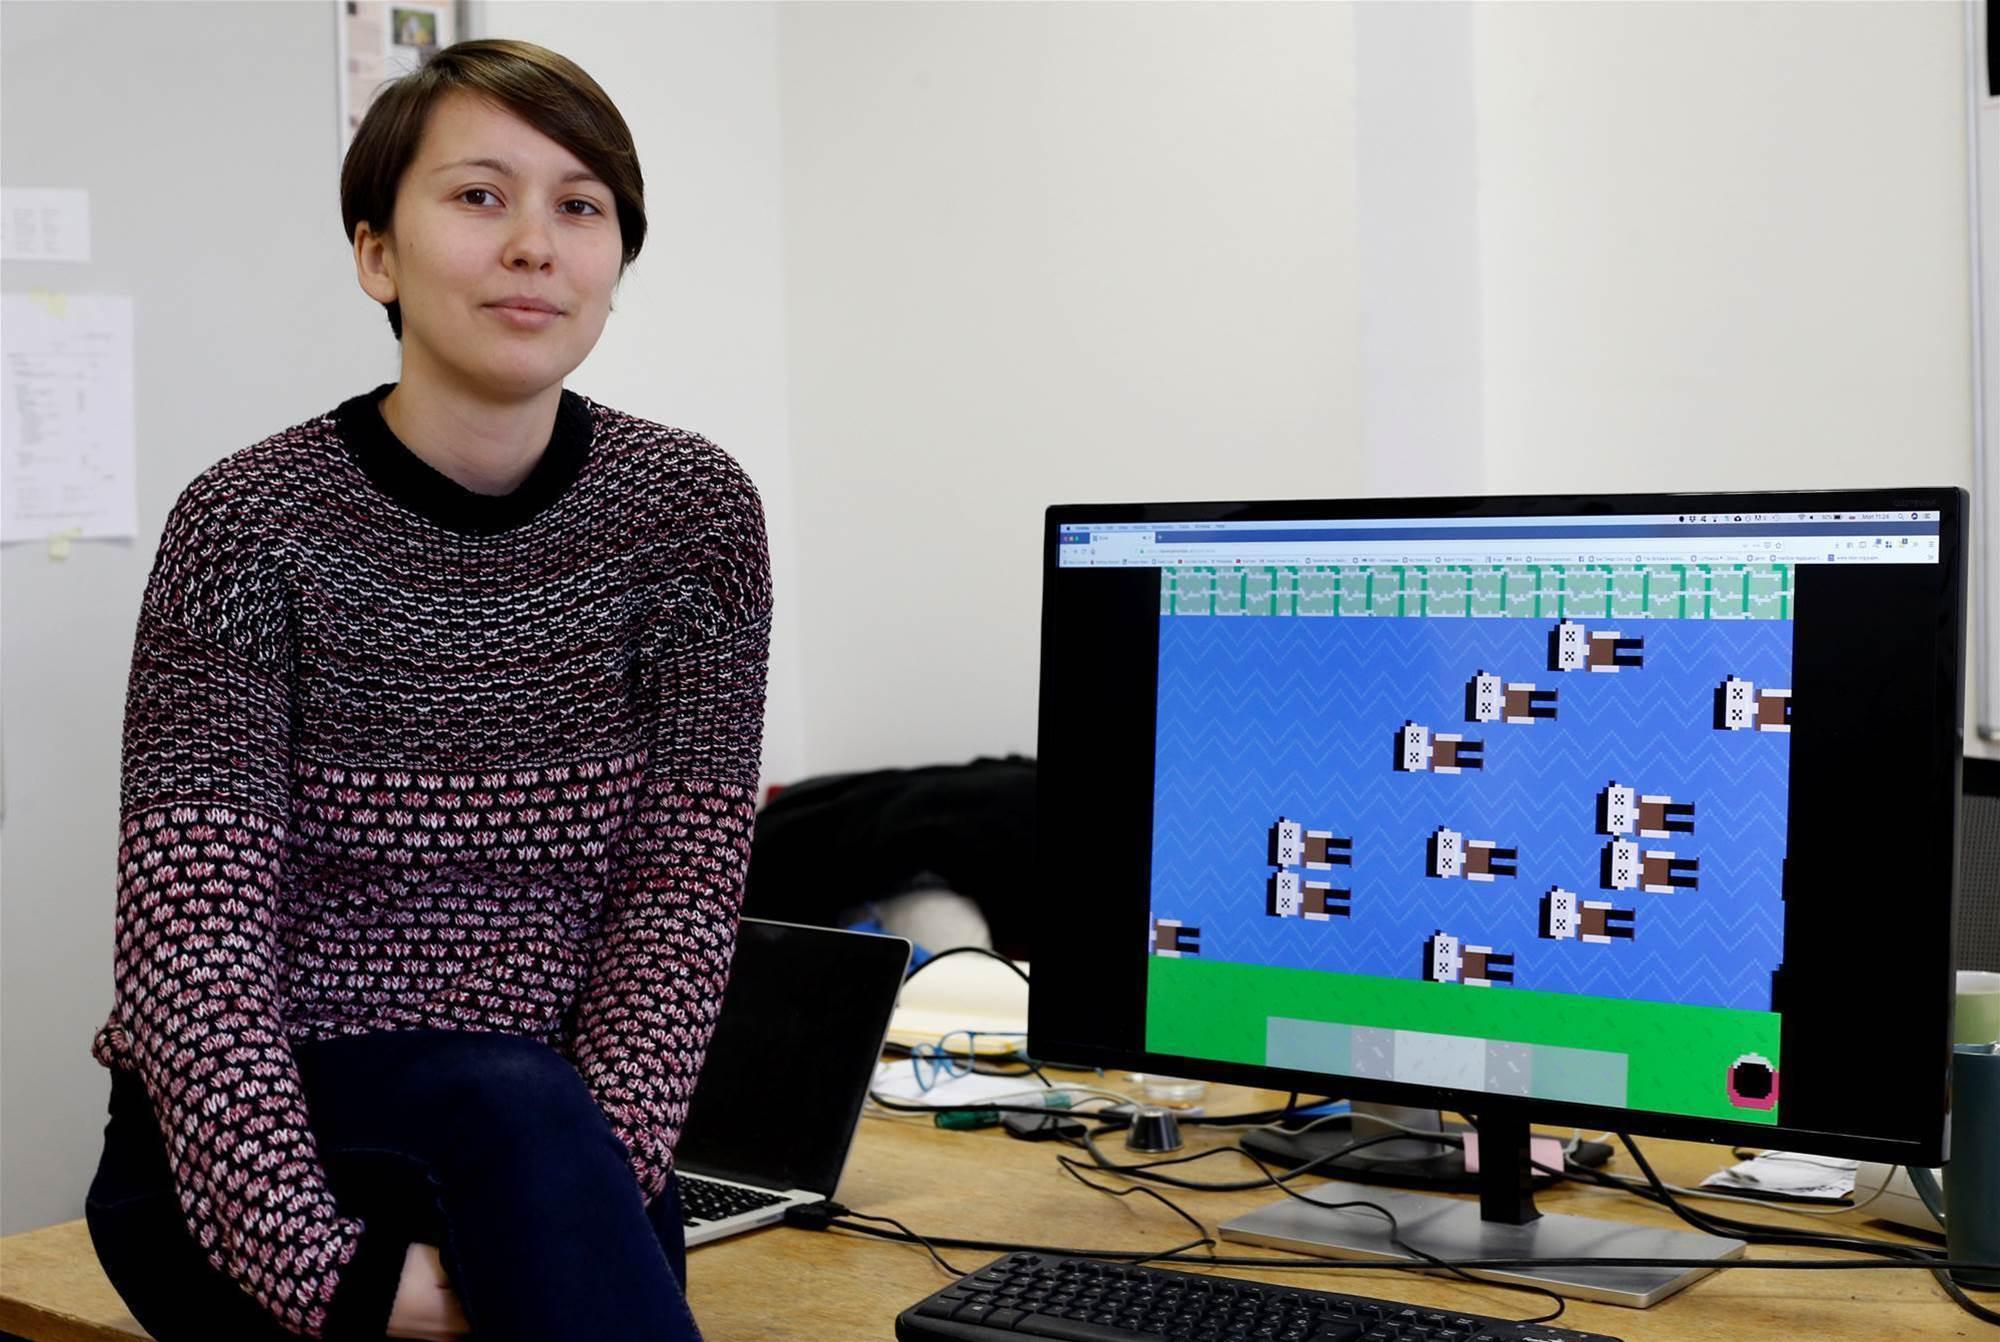 Online game 'Razor Wire' highlights migrants' hardship